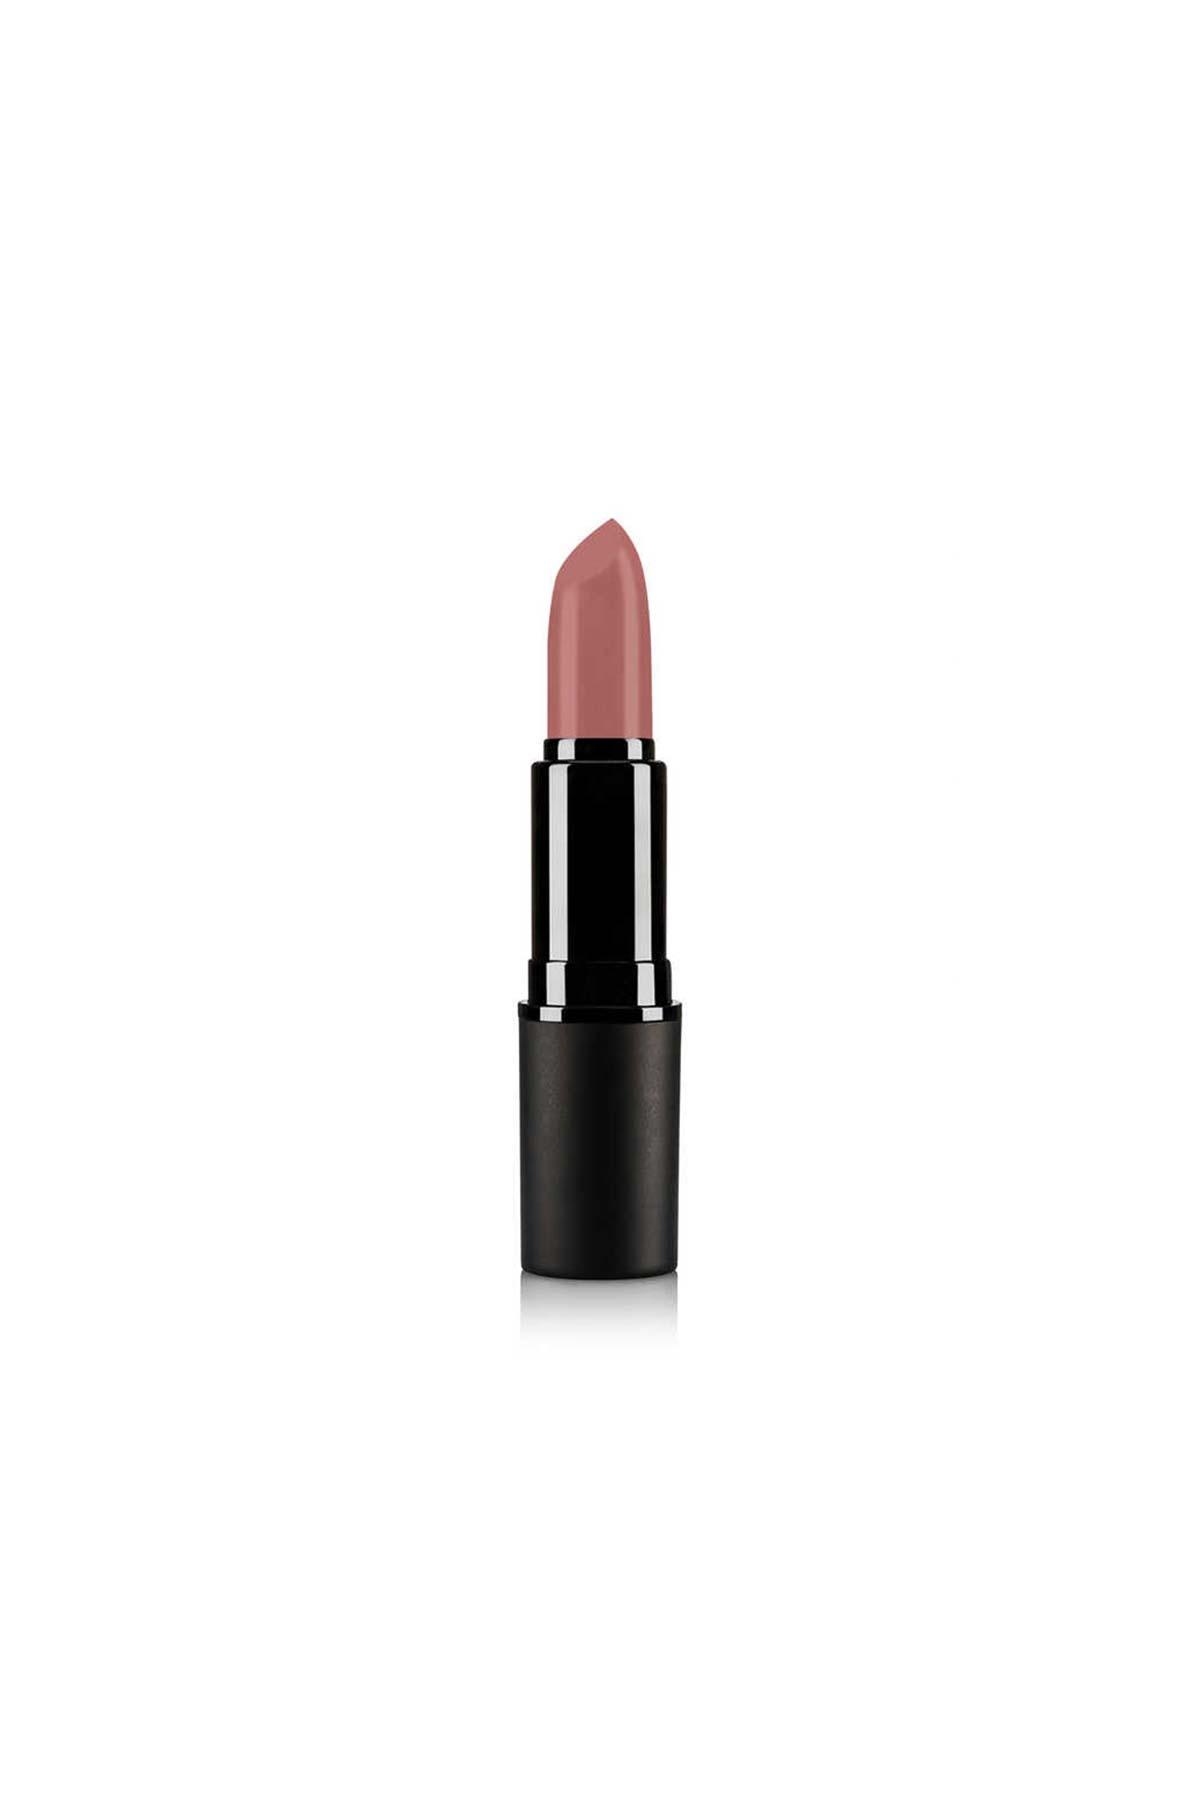 Matte Lipstick - 183 -Ruj - Lipstick Thumbnail